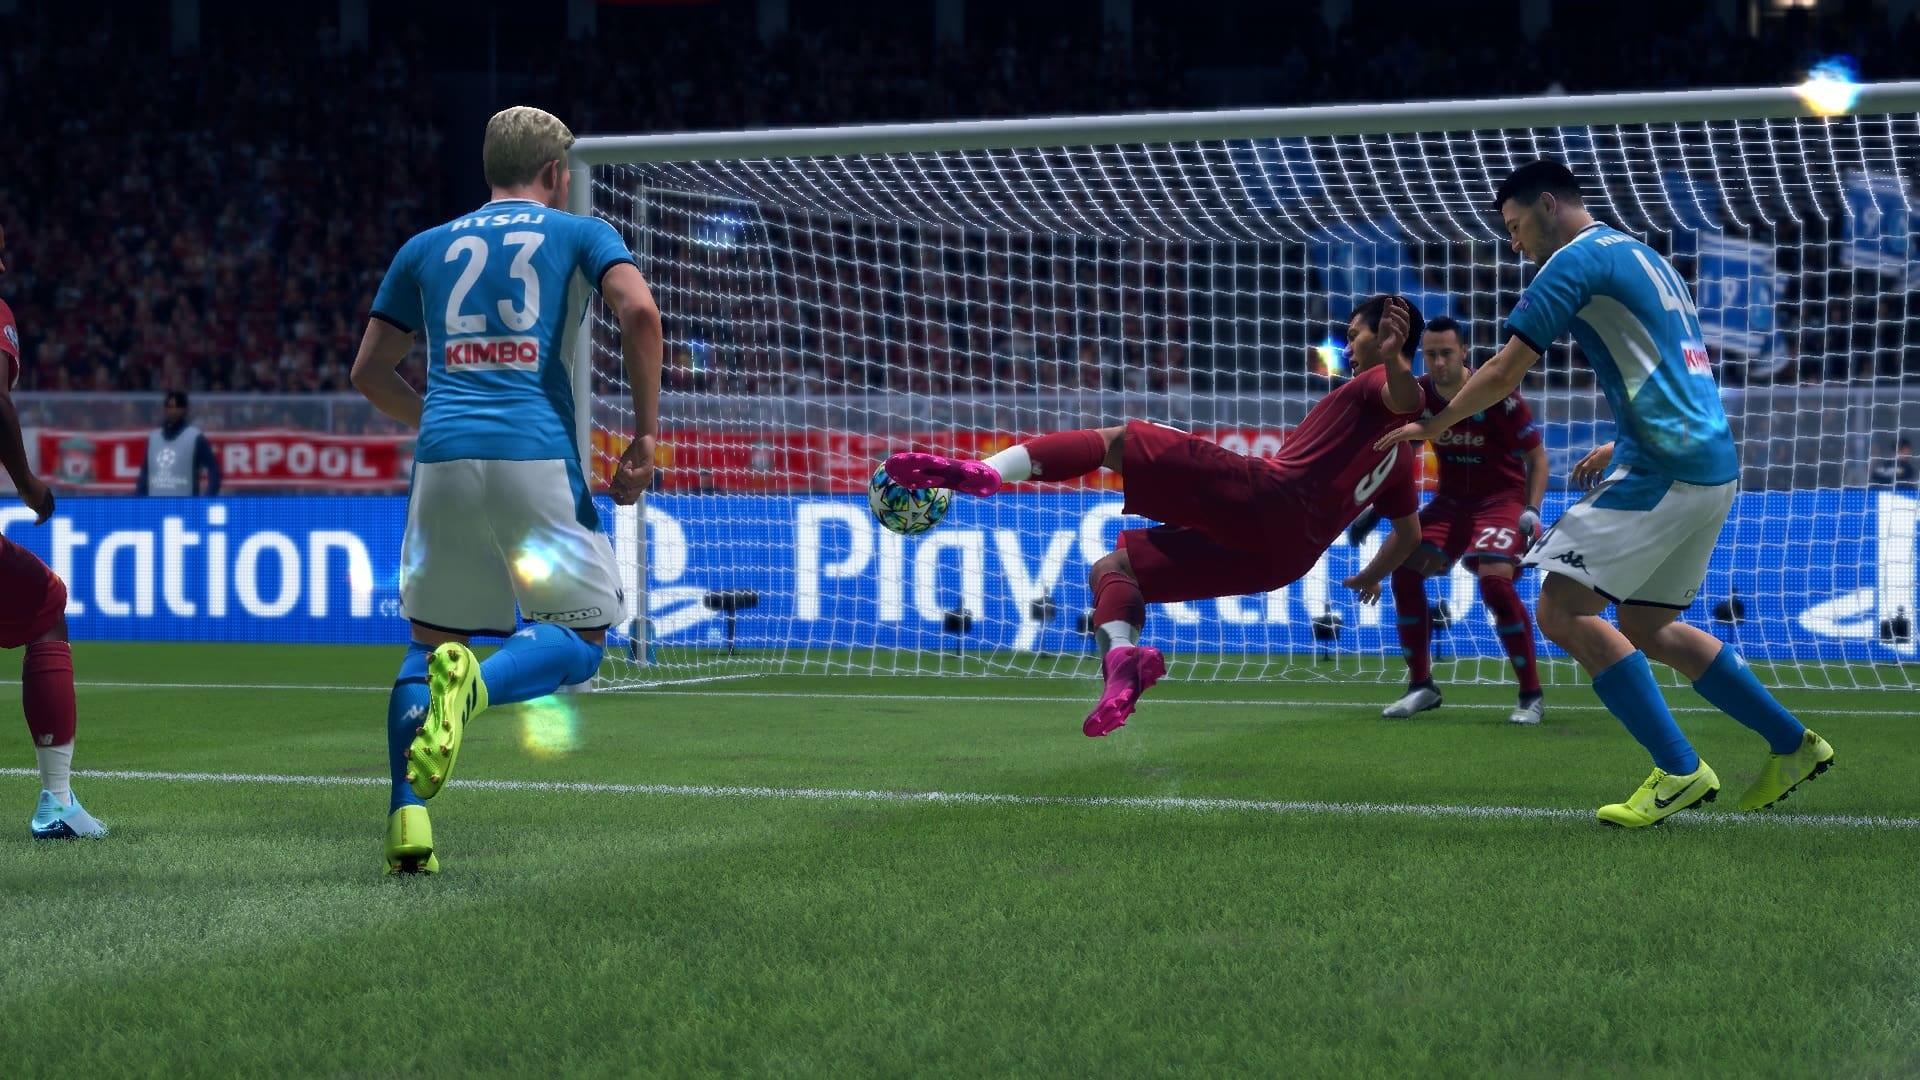 FIFA 20; screenshot: nožničky